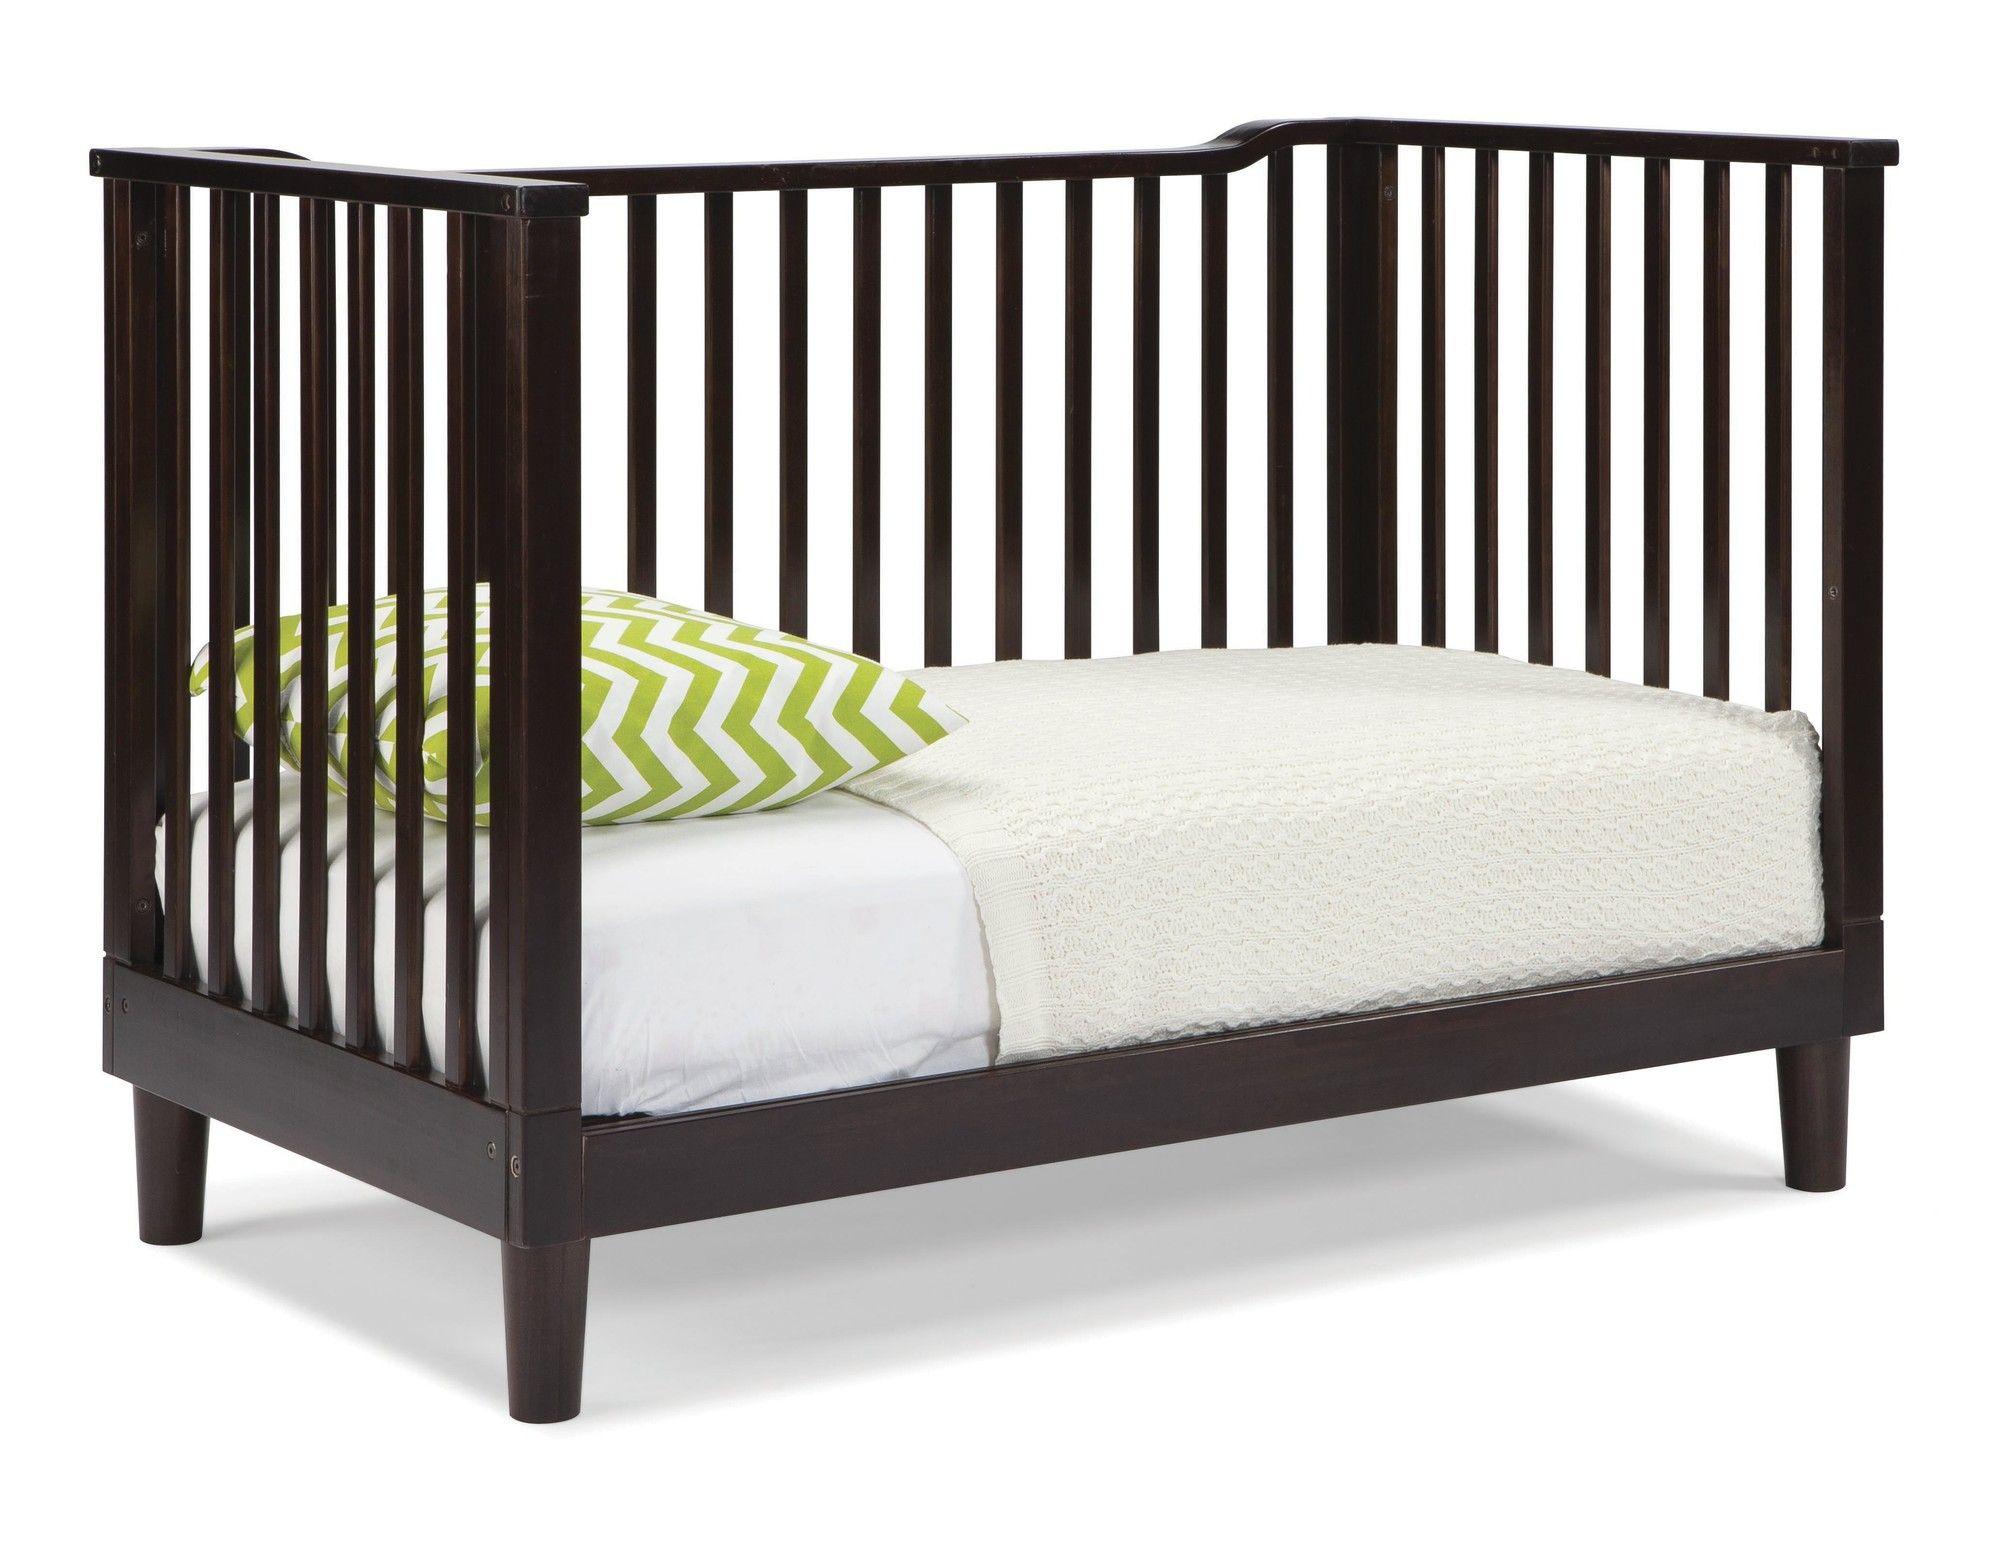 Stork craft crib reviews - Storkcraft Santino 3 In 1 Fixed Side Convertible Crib Reviews Wayfair